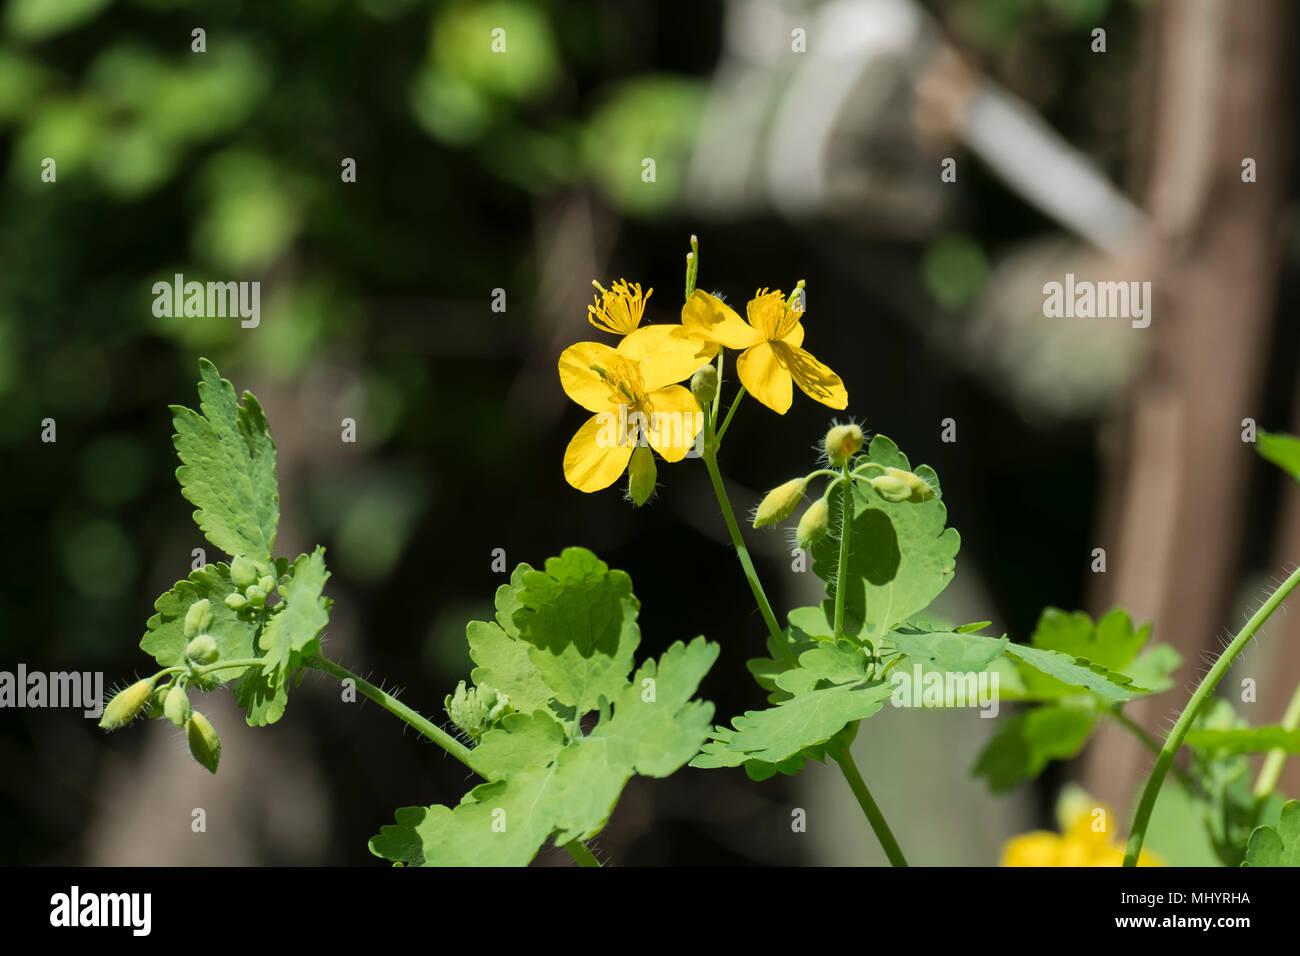 Medicinal herbs bright yellow flowers greater celandine medicinal herbs bright yellow flowers greater celandine chelidonium majus mightylinksfo